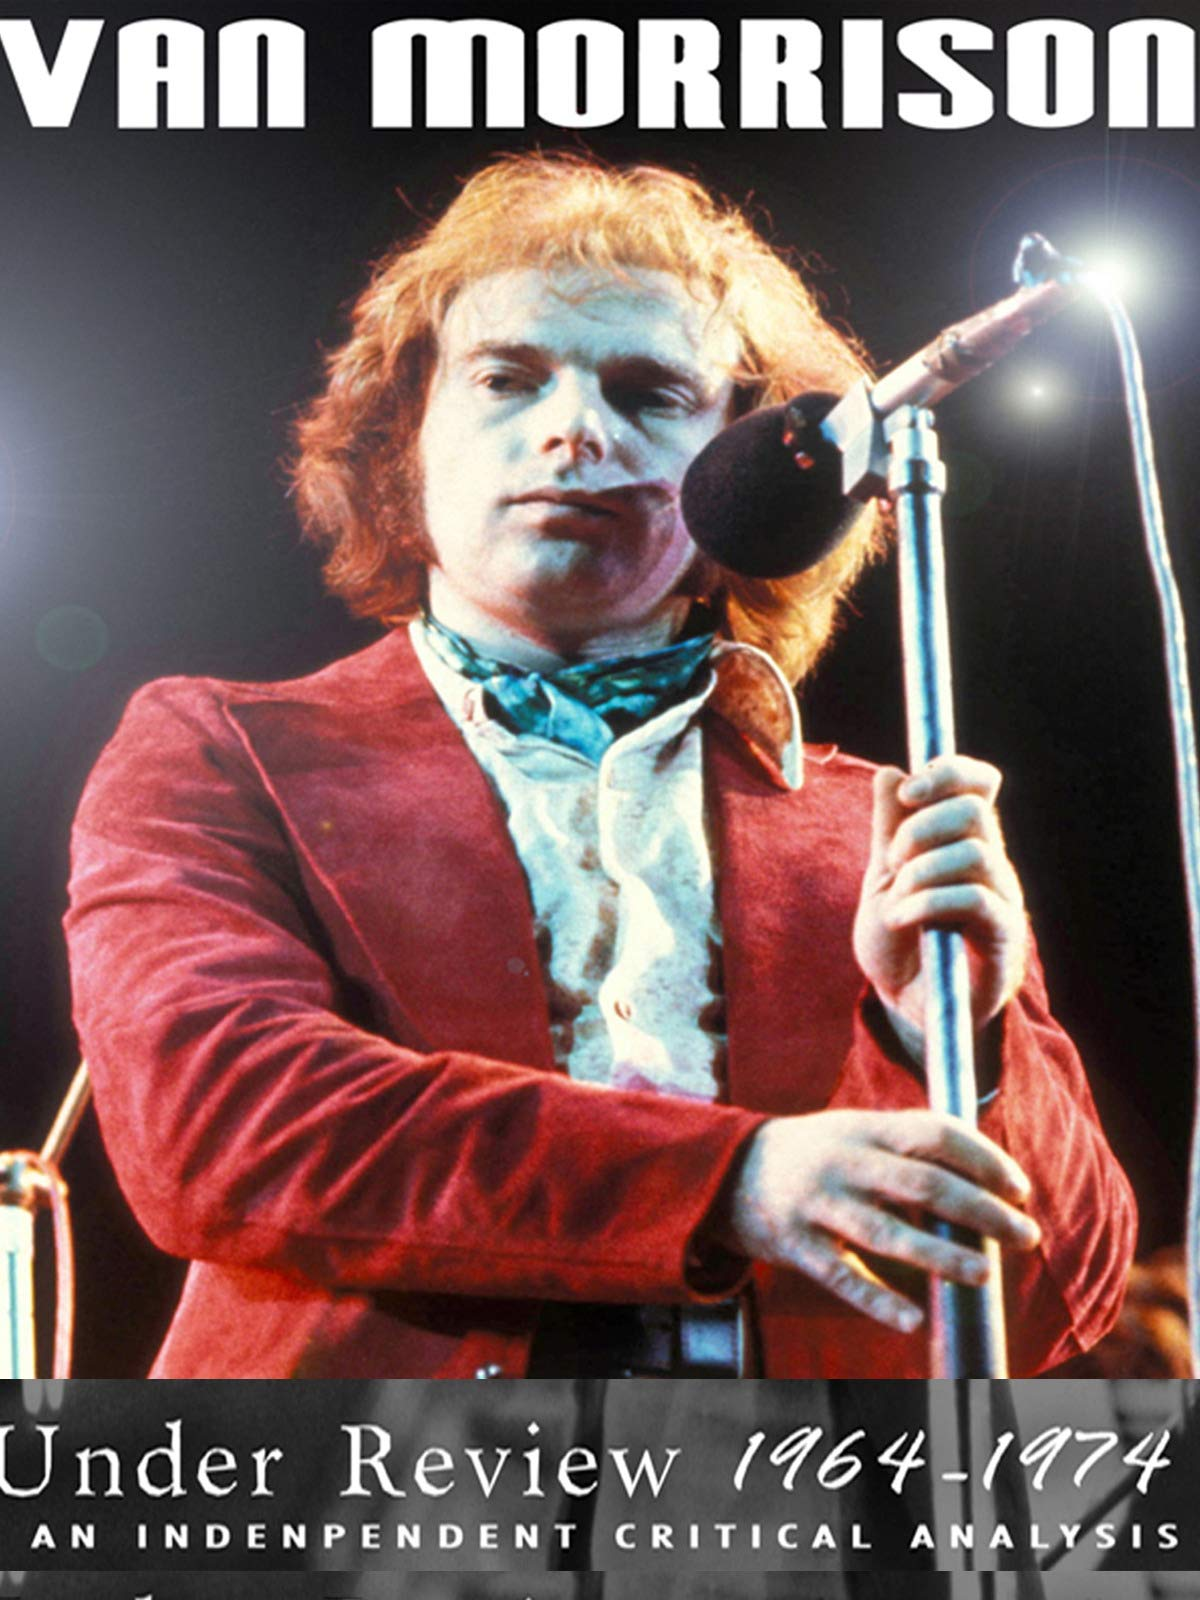 Van Morrison - Under Review: 1964-1974